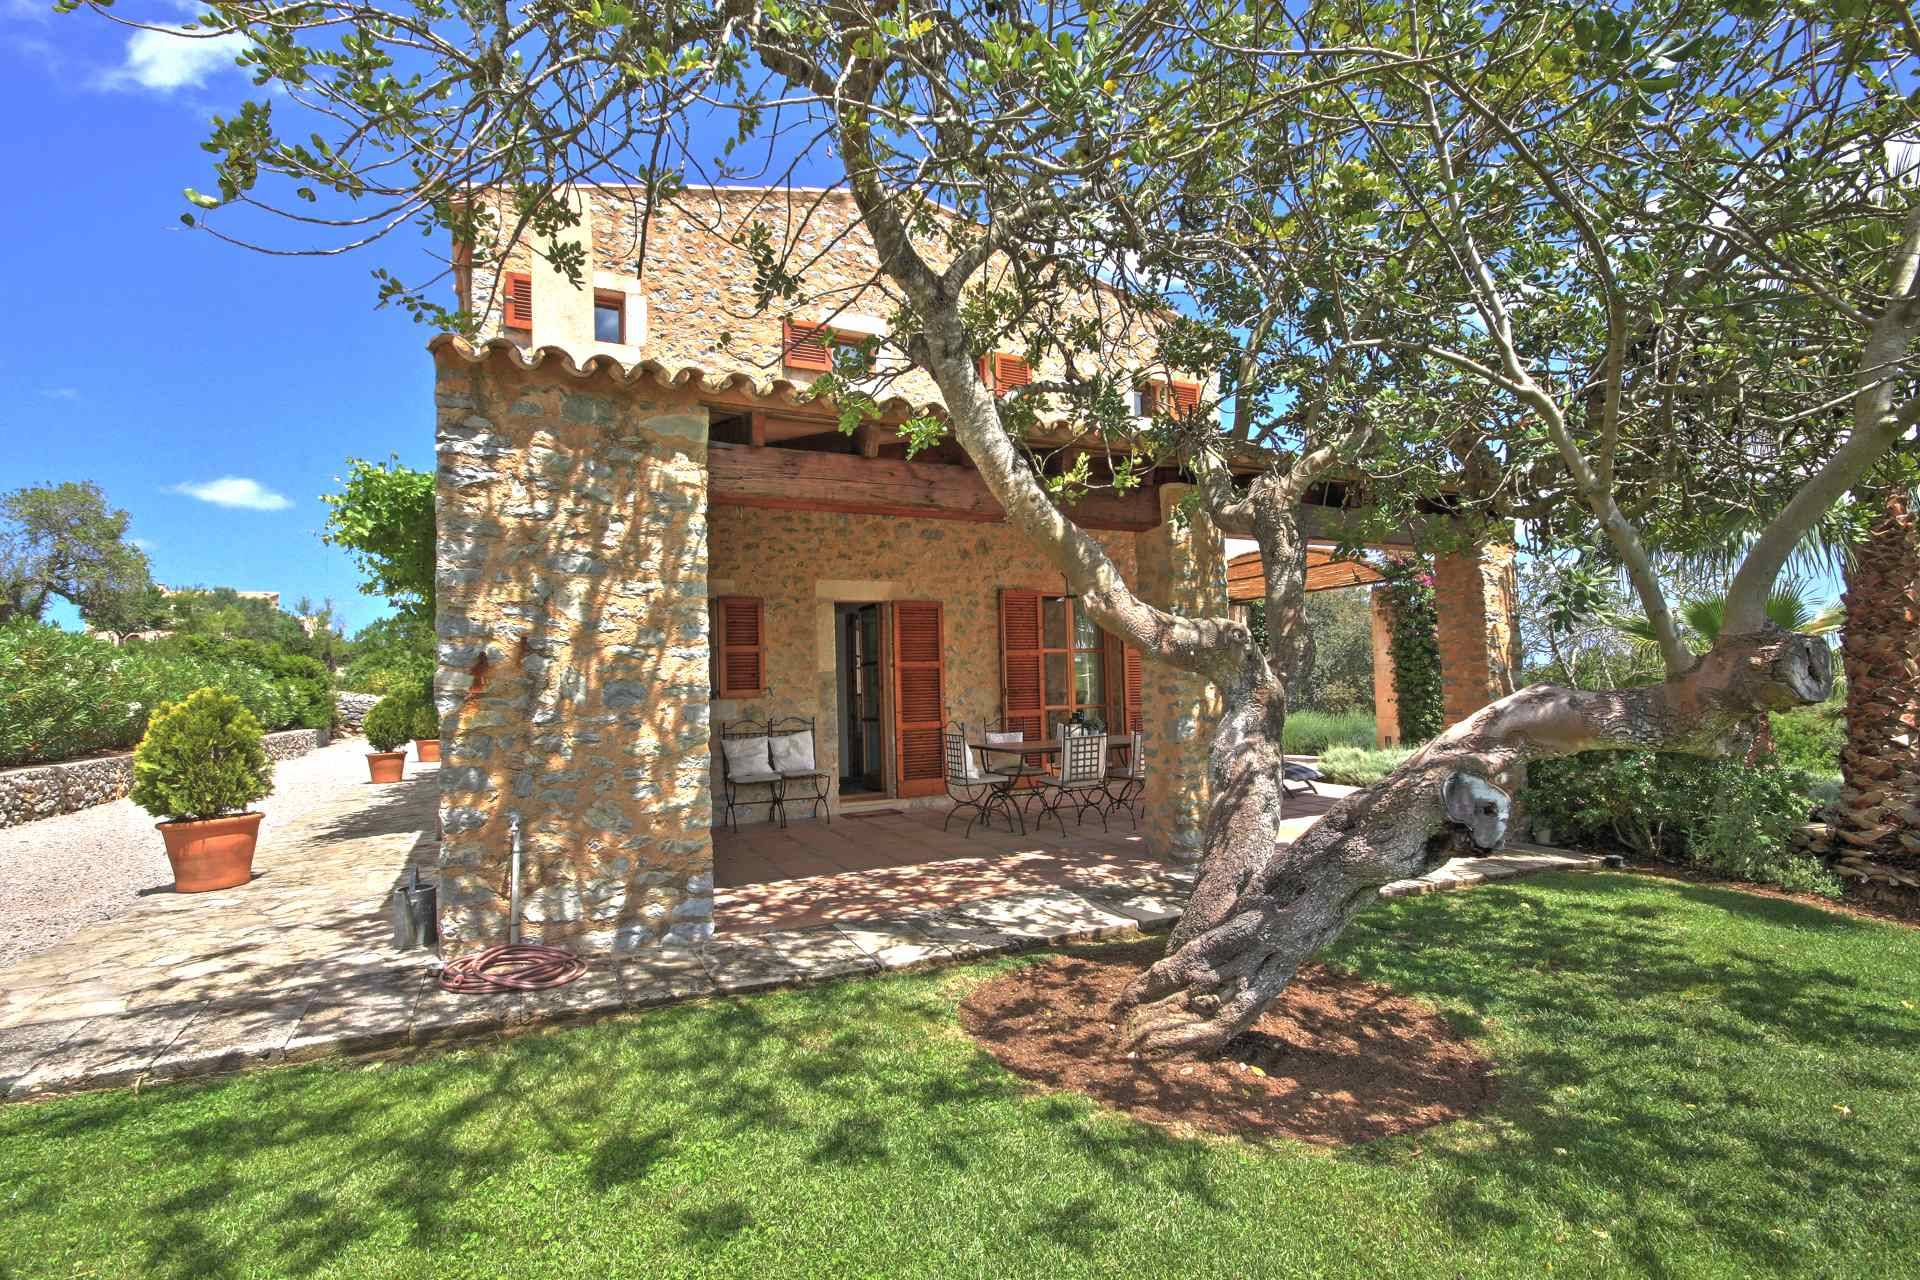 01-51 Authentic Finca Mallorca Northeast Bild 8